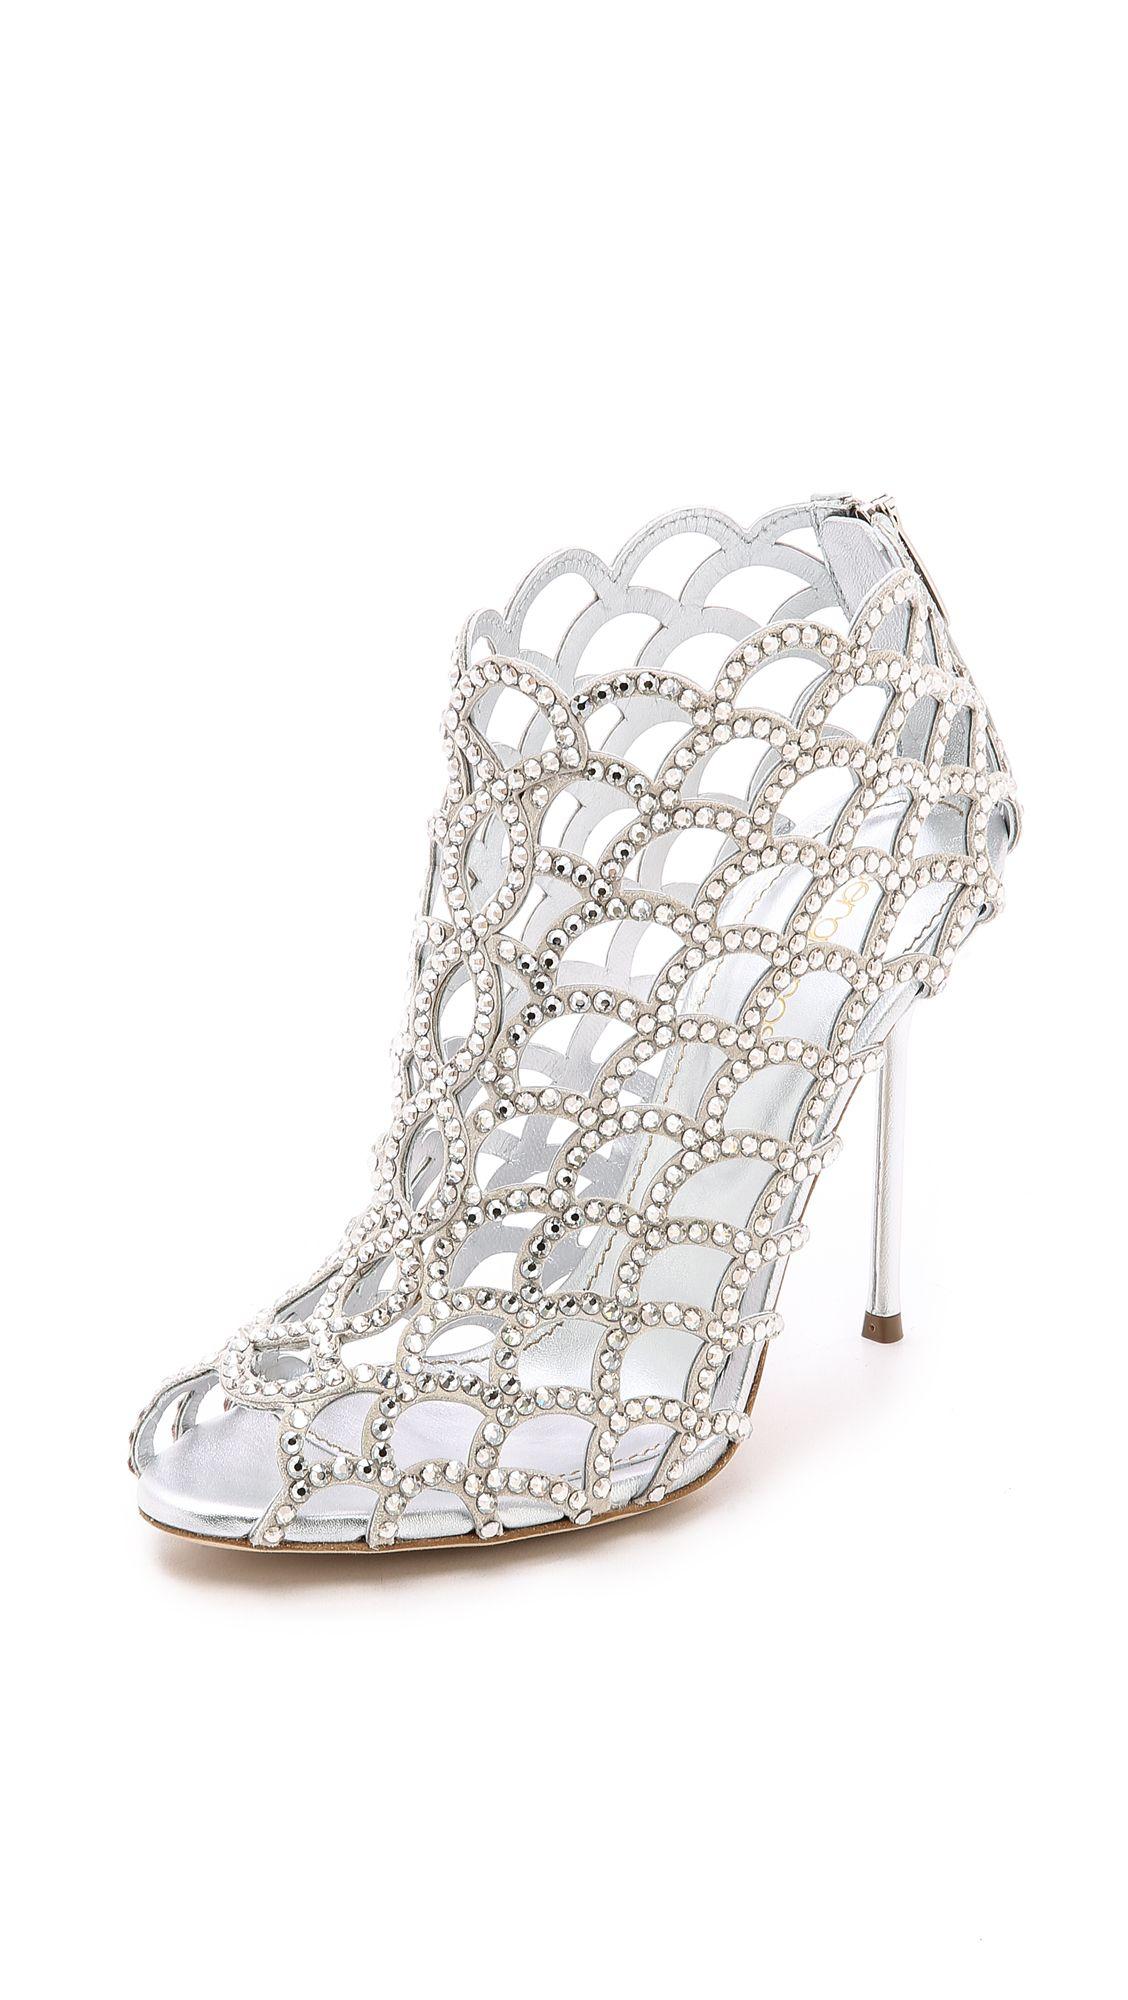 413d613441c Sergio Rossi Mermaid Cage Booties. Love these swanky wedding ...